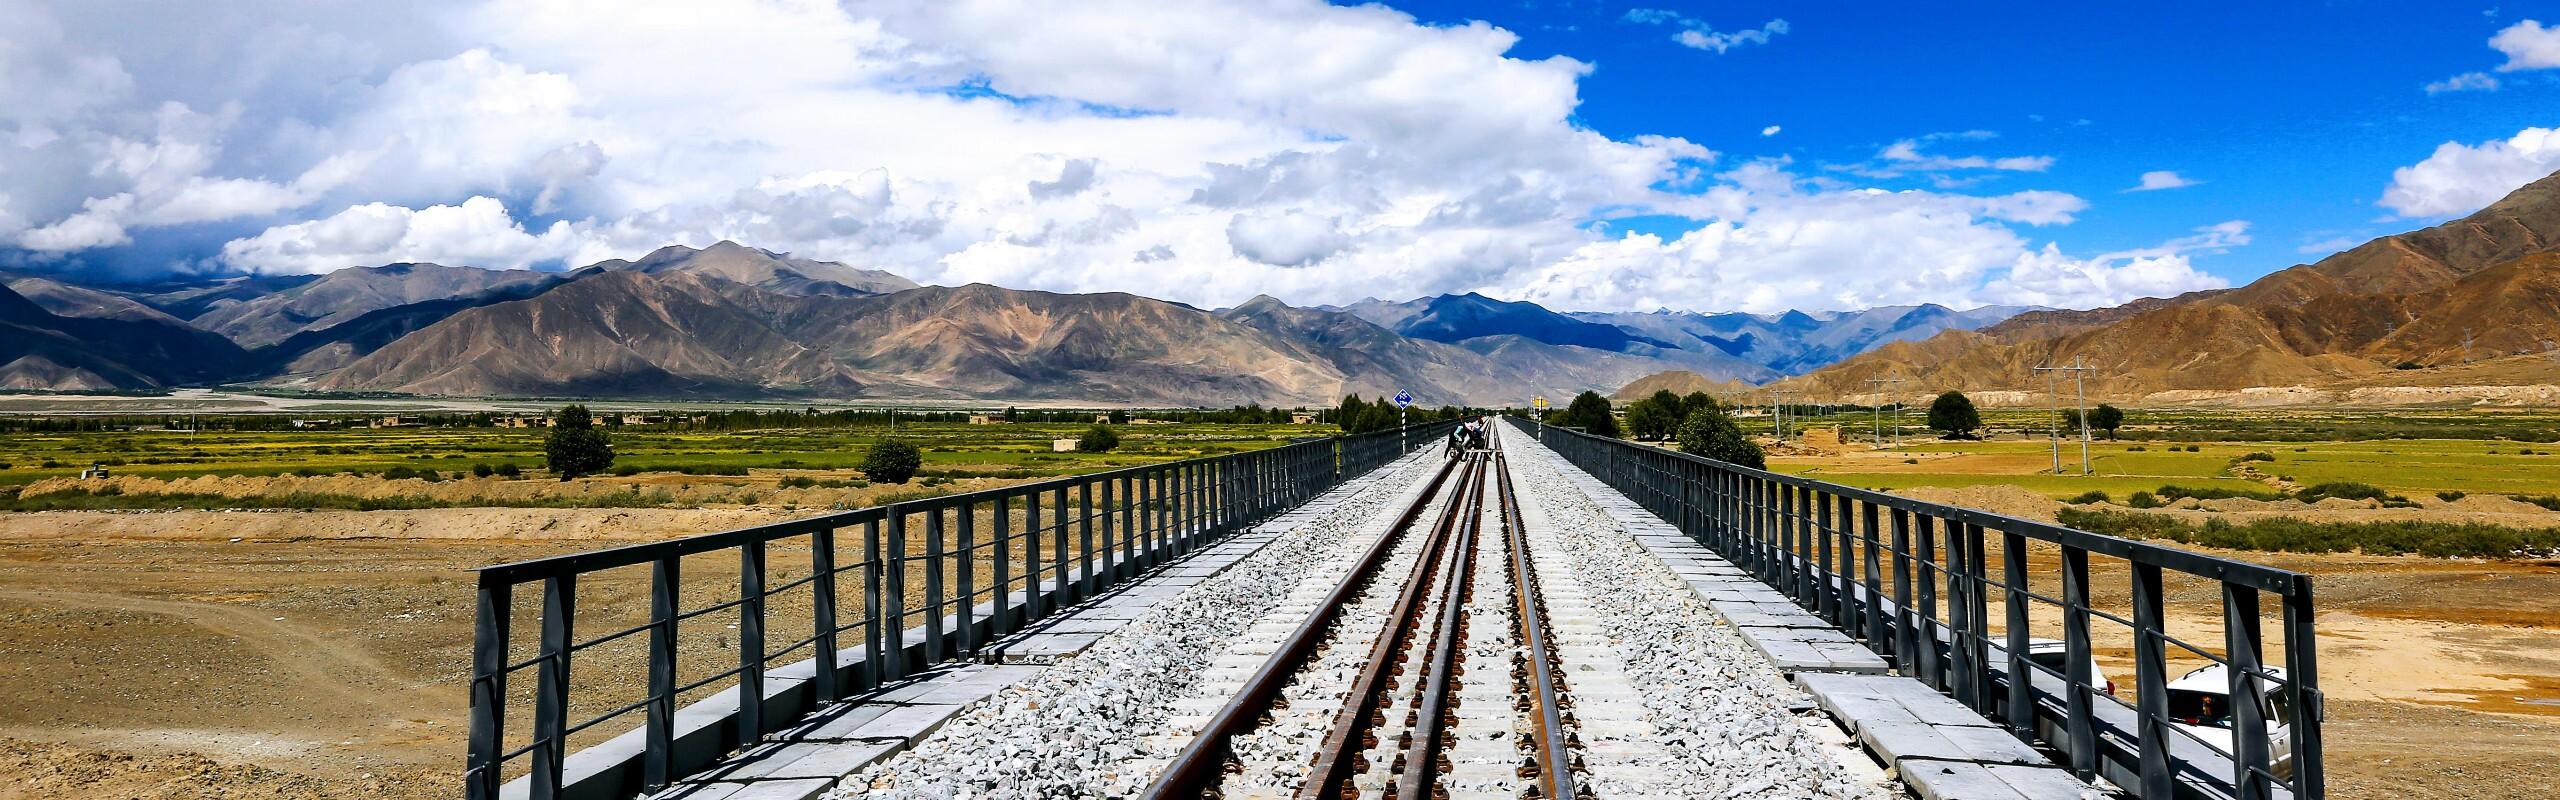 Tibet by Rail